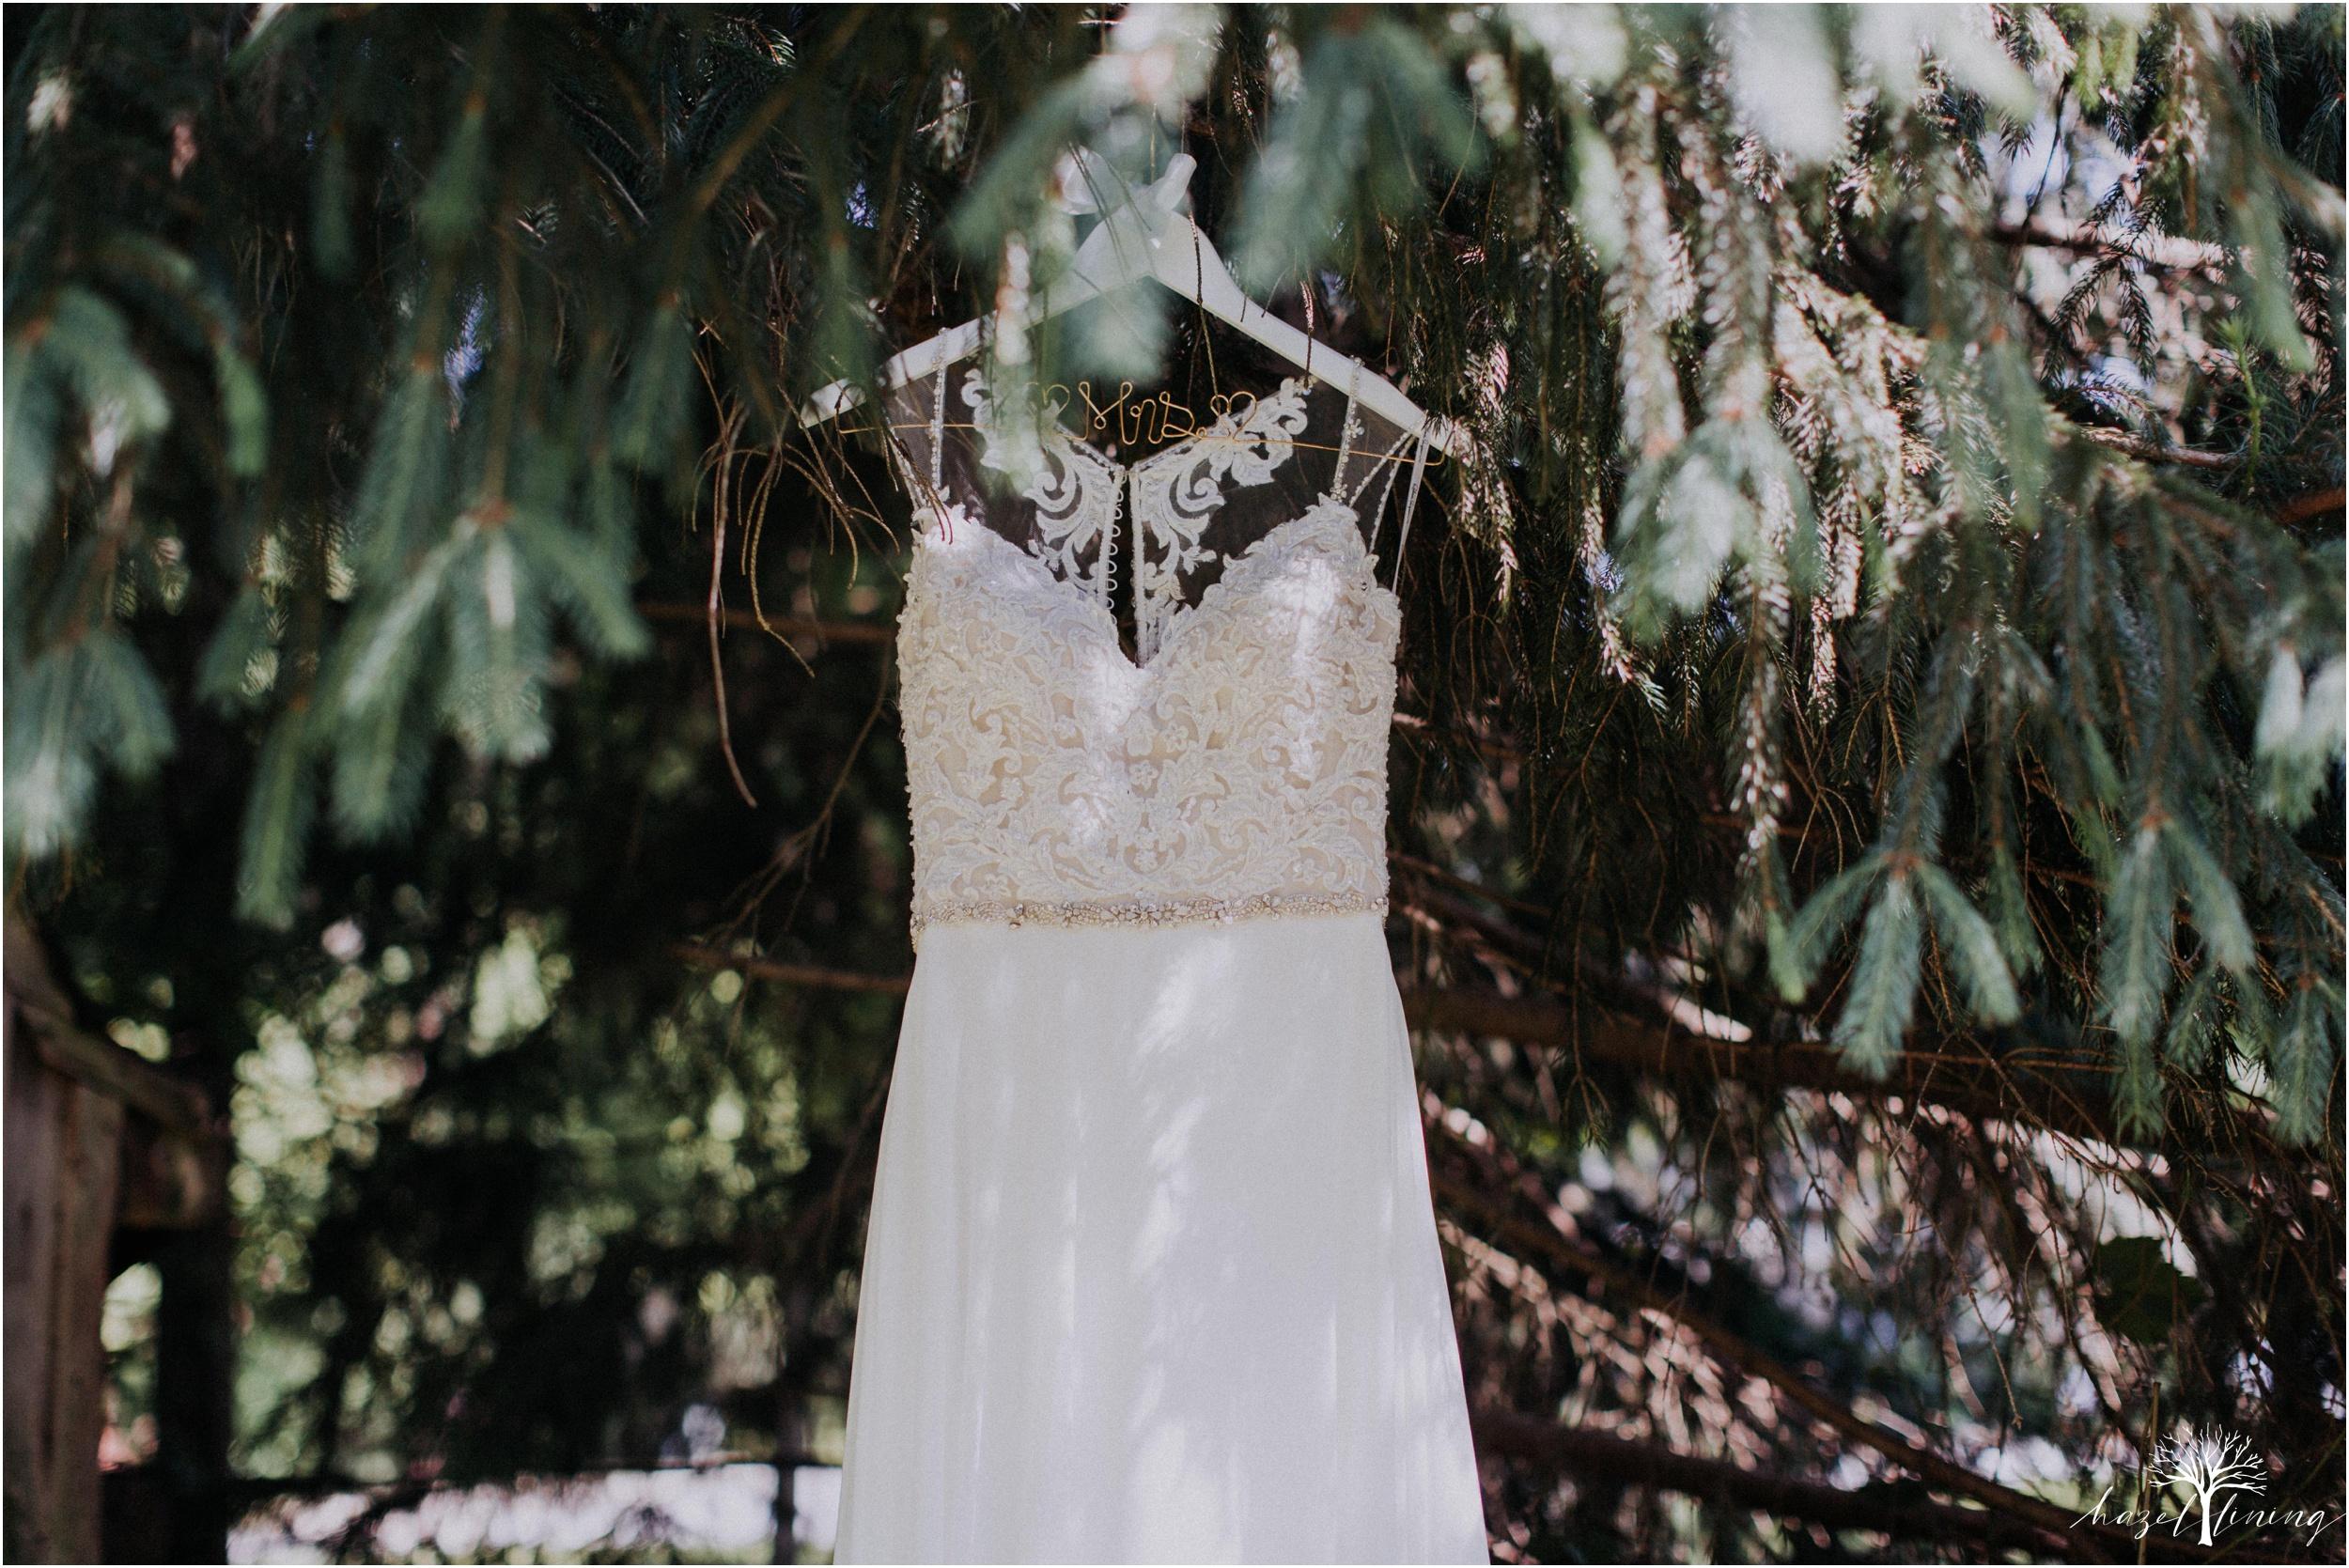 hazel-lining-travel-wedding-elopement-photography_0006.jpg